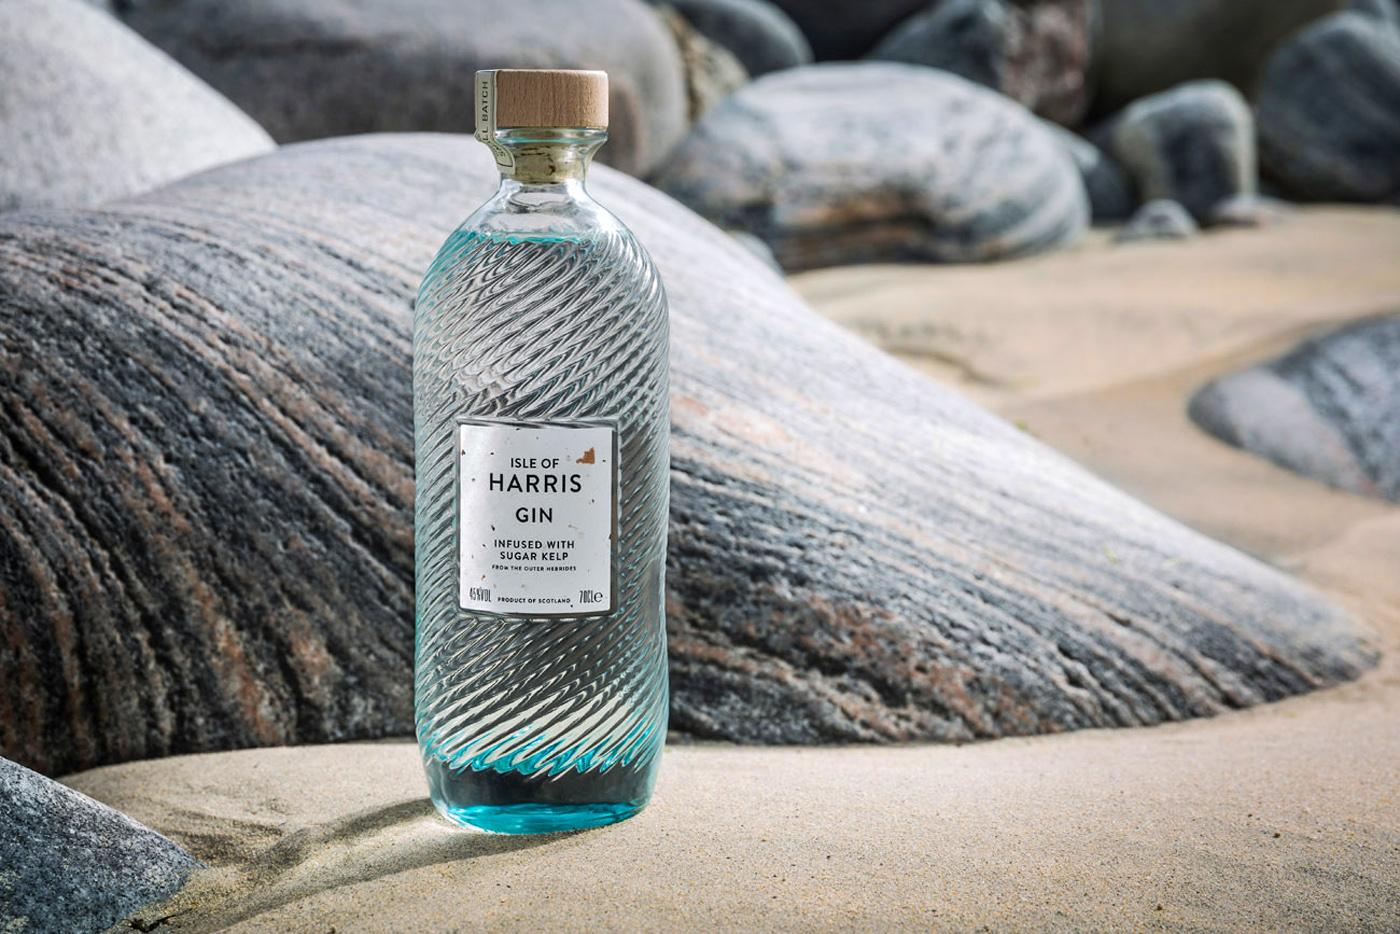 Harris Distillery gin bottle on the beach